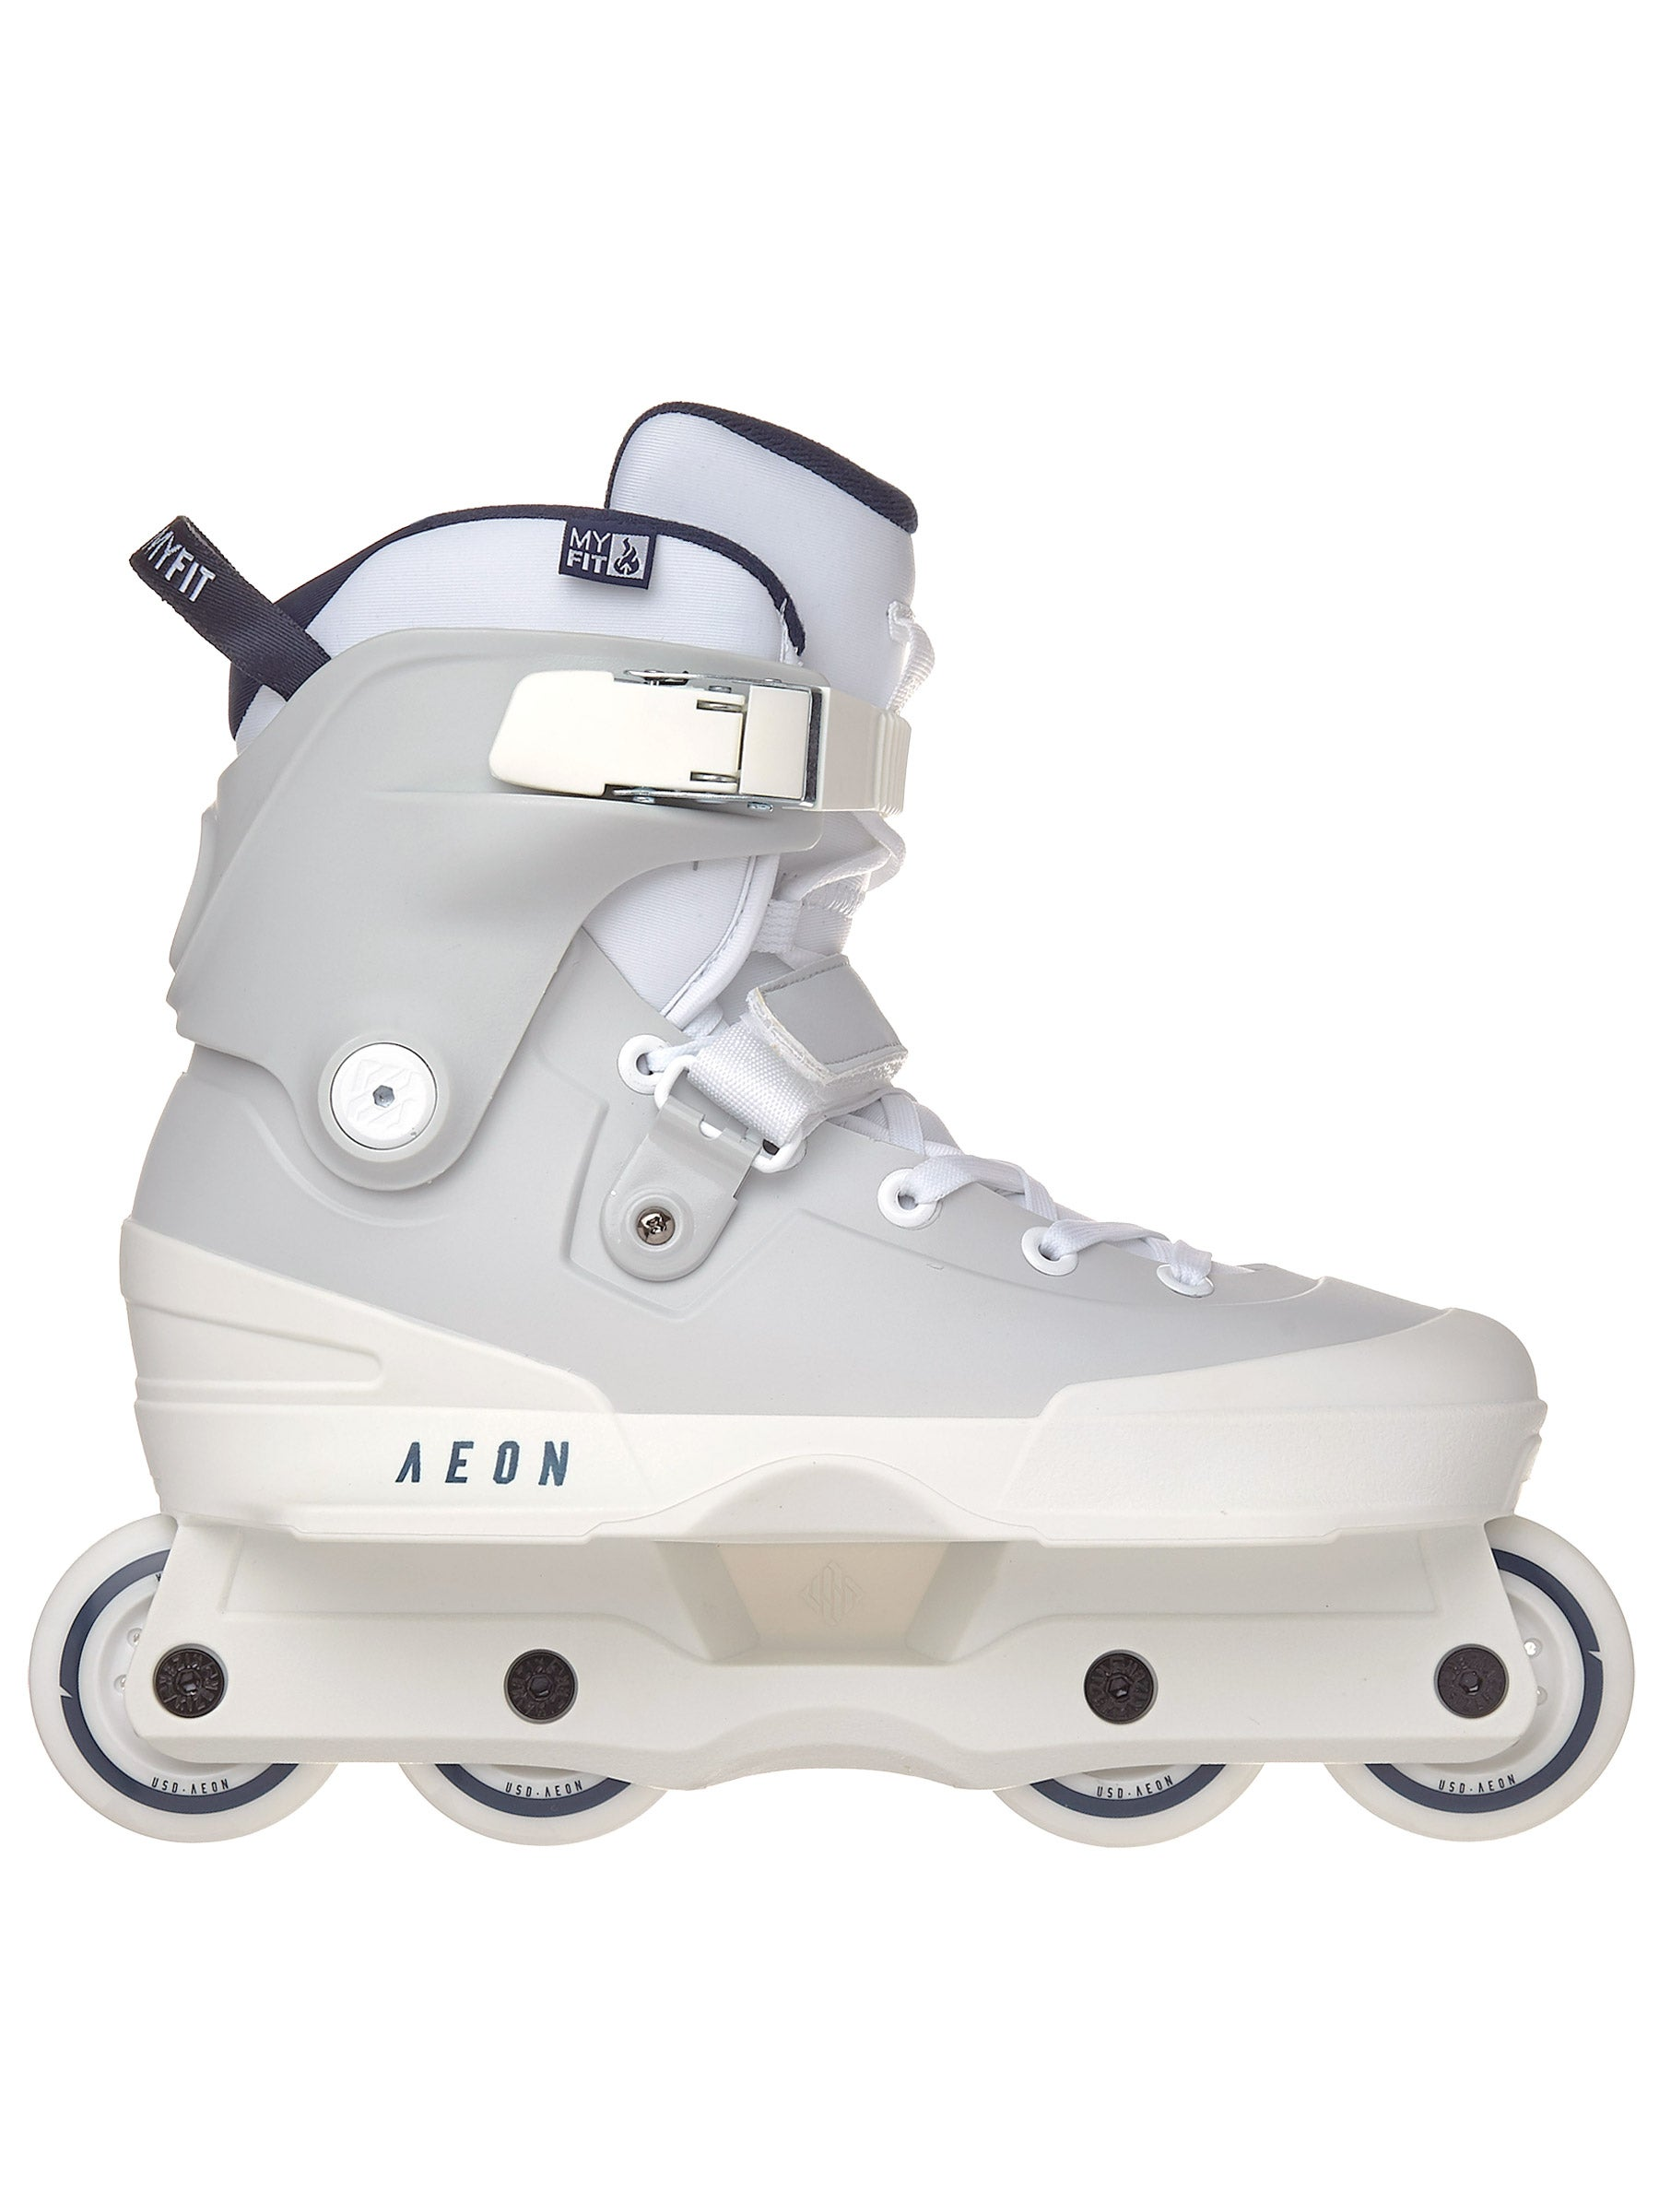 Grey Usd Aeon 72 Aggressive Inline Skates Inlineskating-Artikel